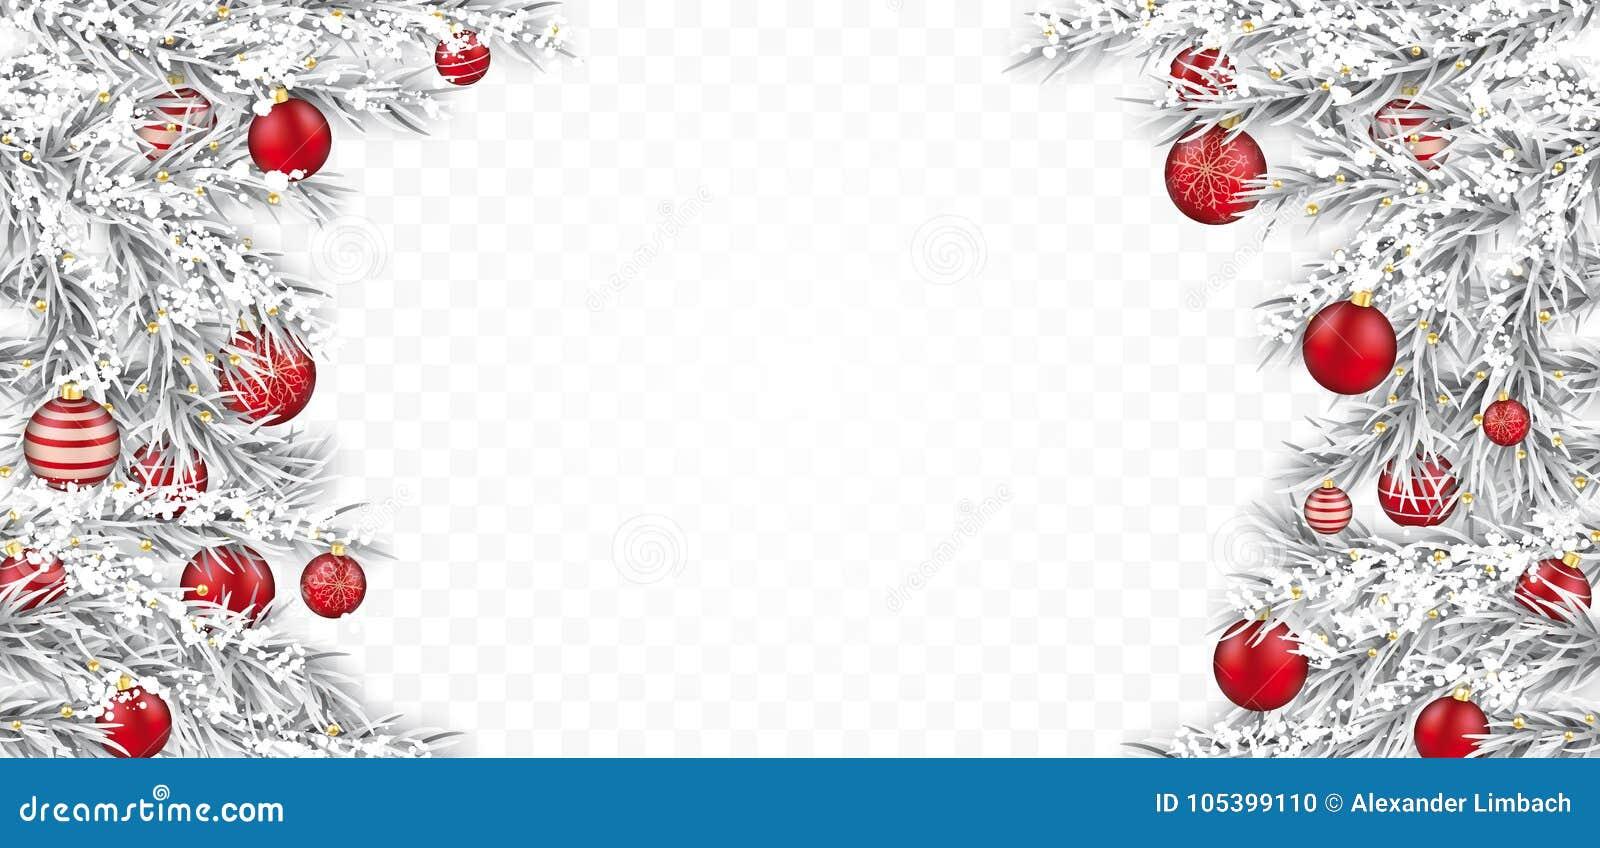 Christmas Header Transparent.Frozen Twigs Red Baubles Transparent Header Stock Vector